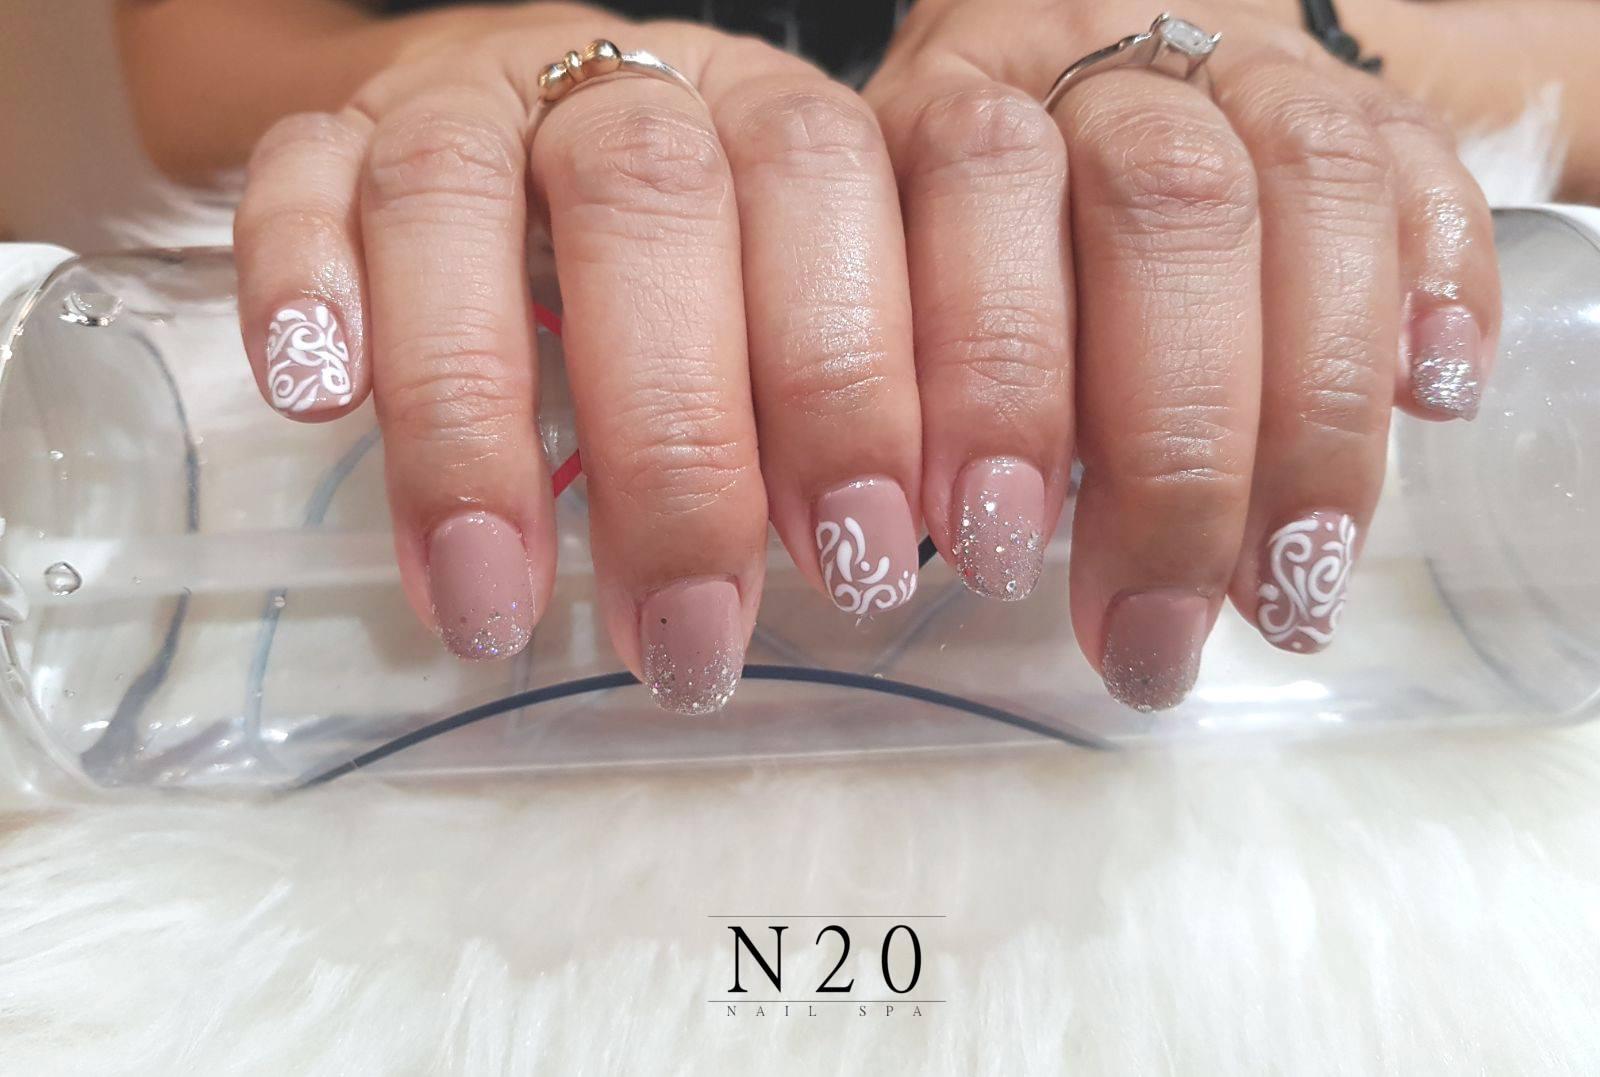 Pink white basic flora manicure nail art - N20 Nail Spa